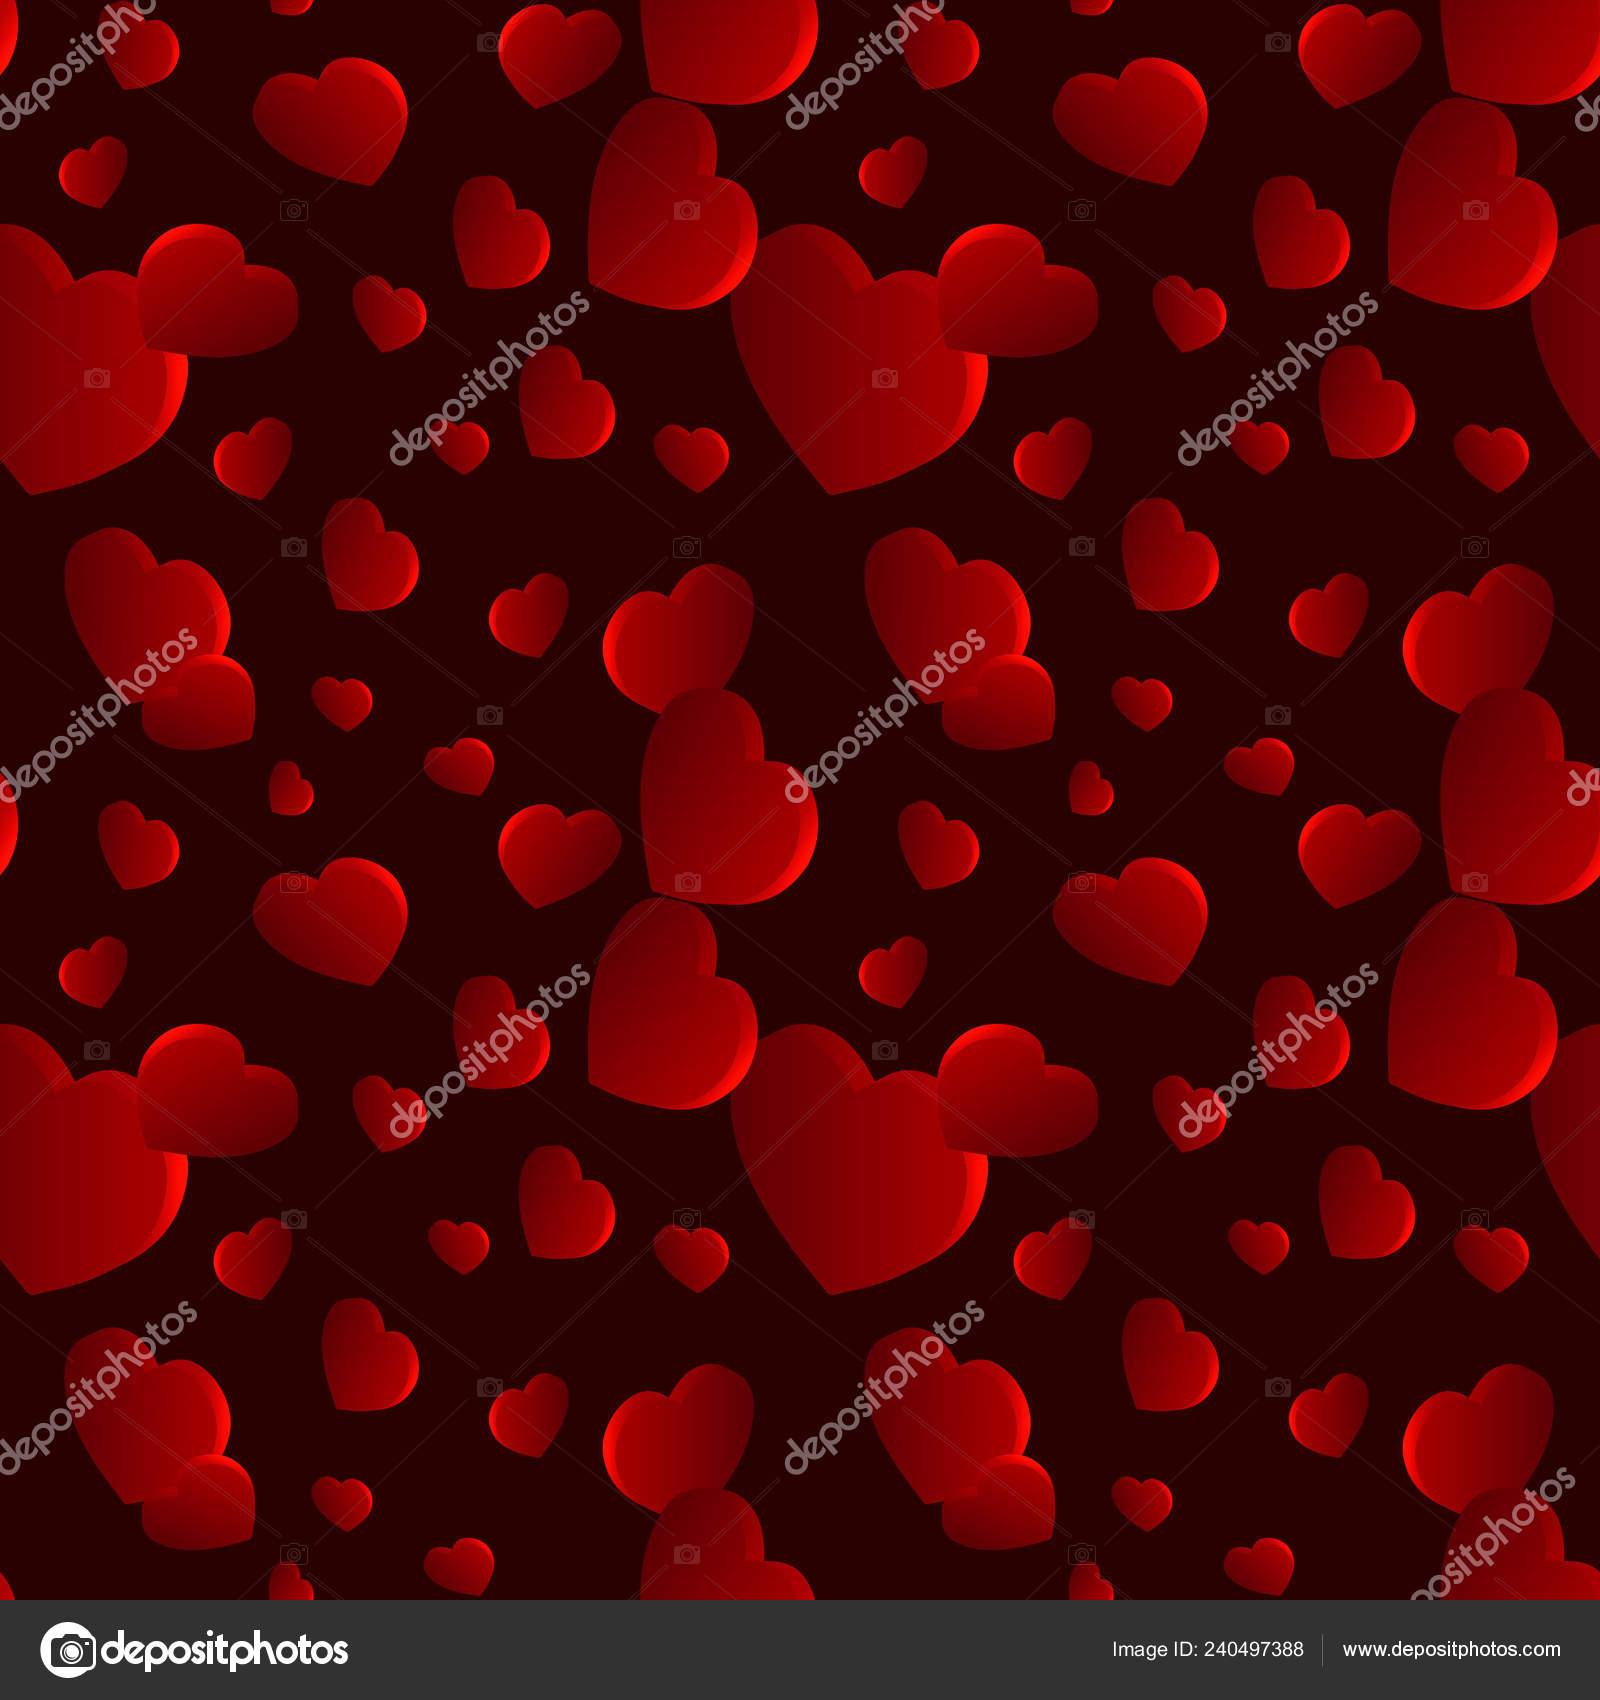 Valentines Day Heart Seamless Pattern Dark Background Valentines Day Background Vector Image By C Kseniiag Vector Stock 240497388